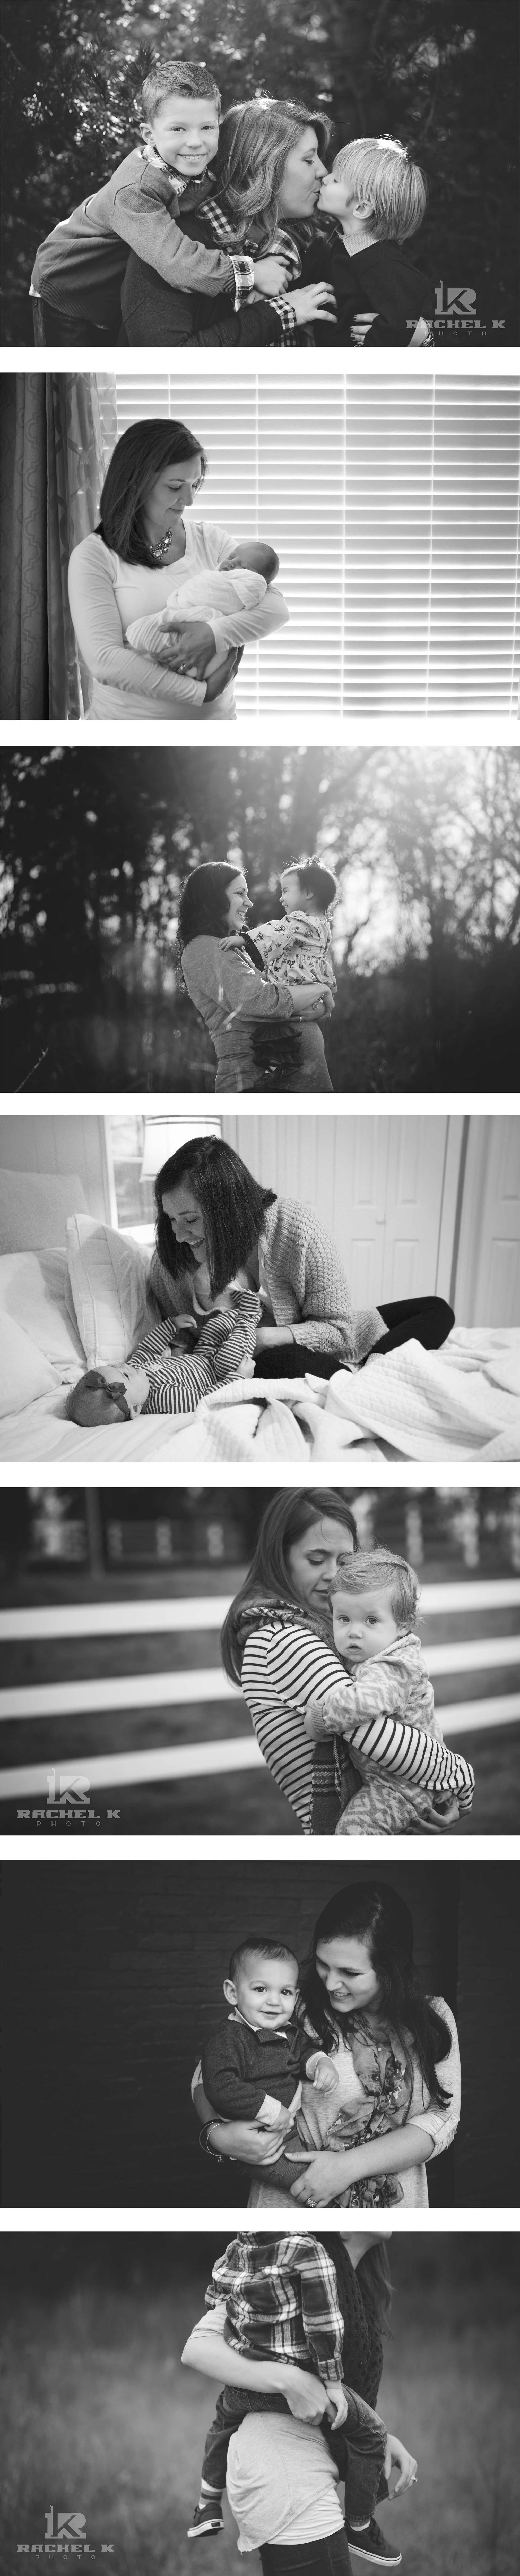 Arlington Virginia family photographer- Mother's Day tribute by Rachel K Photo